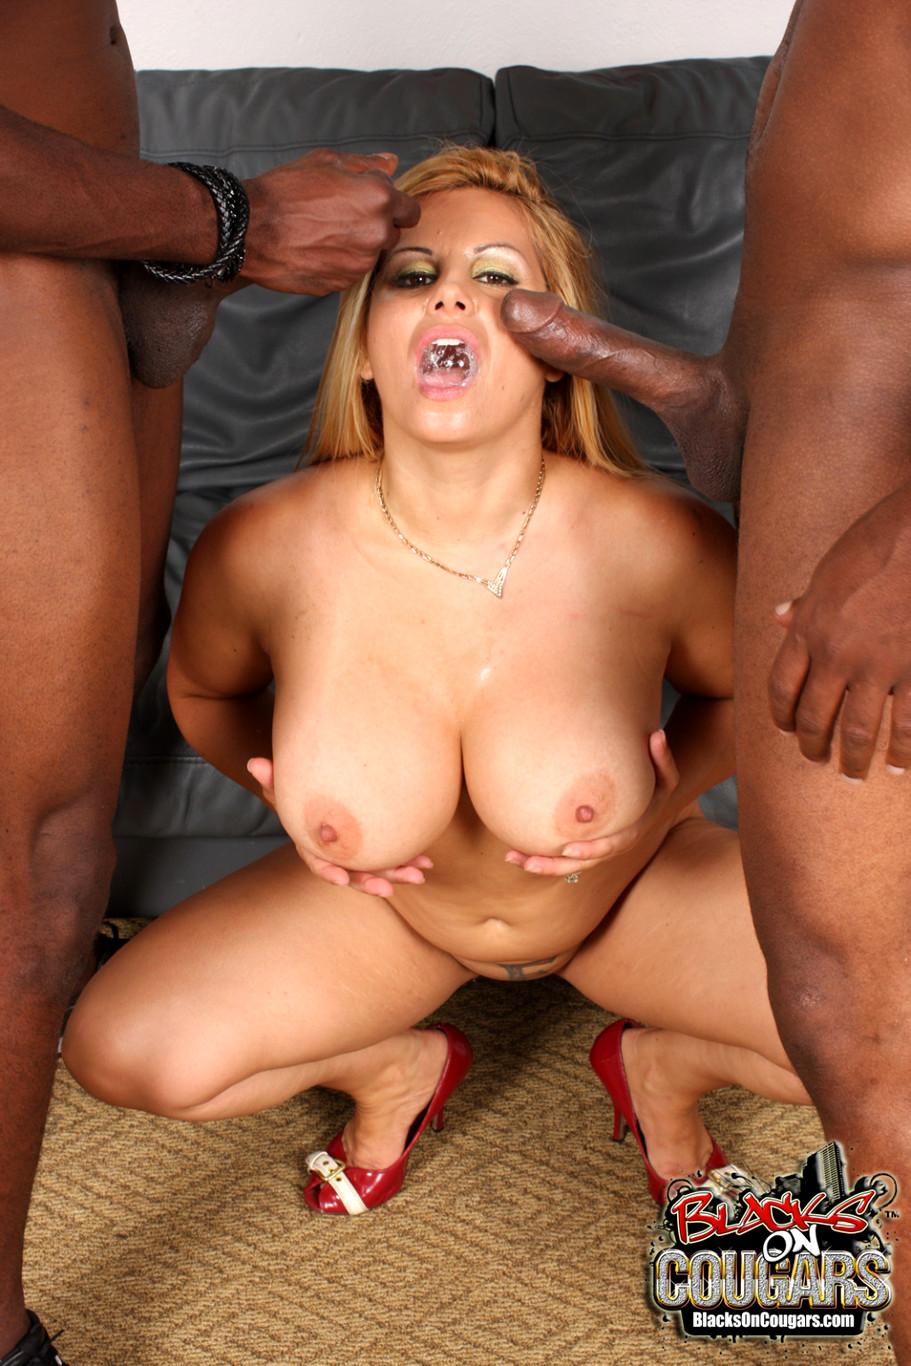 Friday porn star